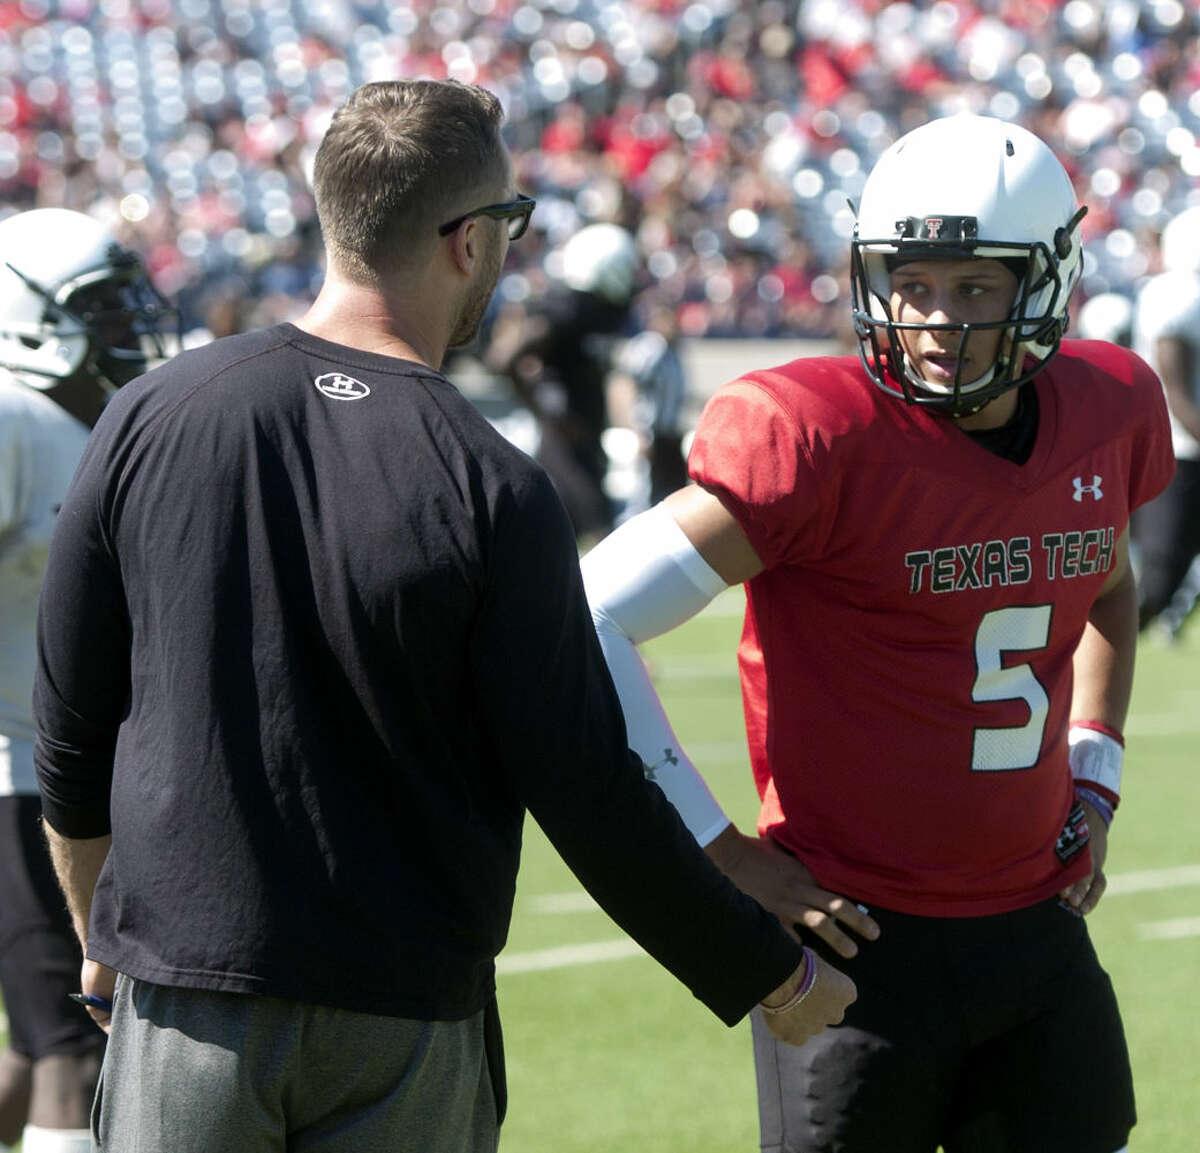 Texas Tech head coach Kliff Kingsbury talks with quarterback Patrick Mahomes (5) during the spring scrimmage on Saturday, March 28, 2015, at Grande Communications Stadium. James Durbin/Reporter-Telegram